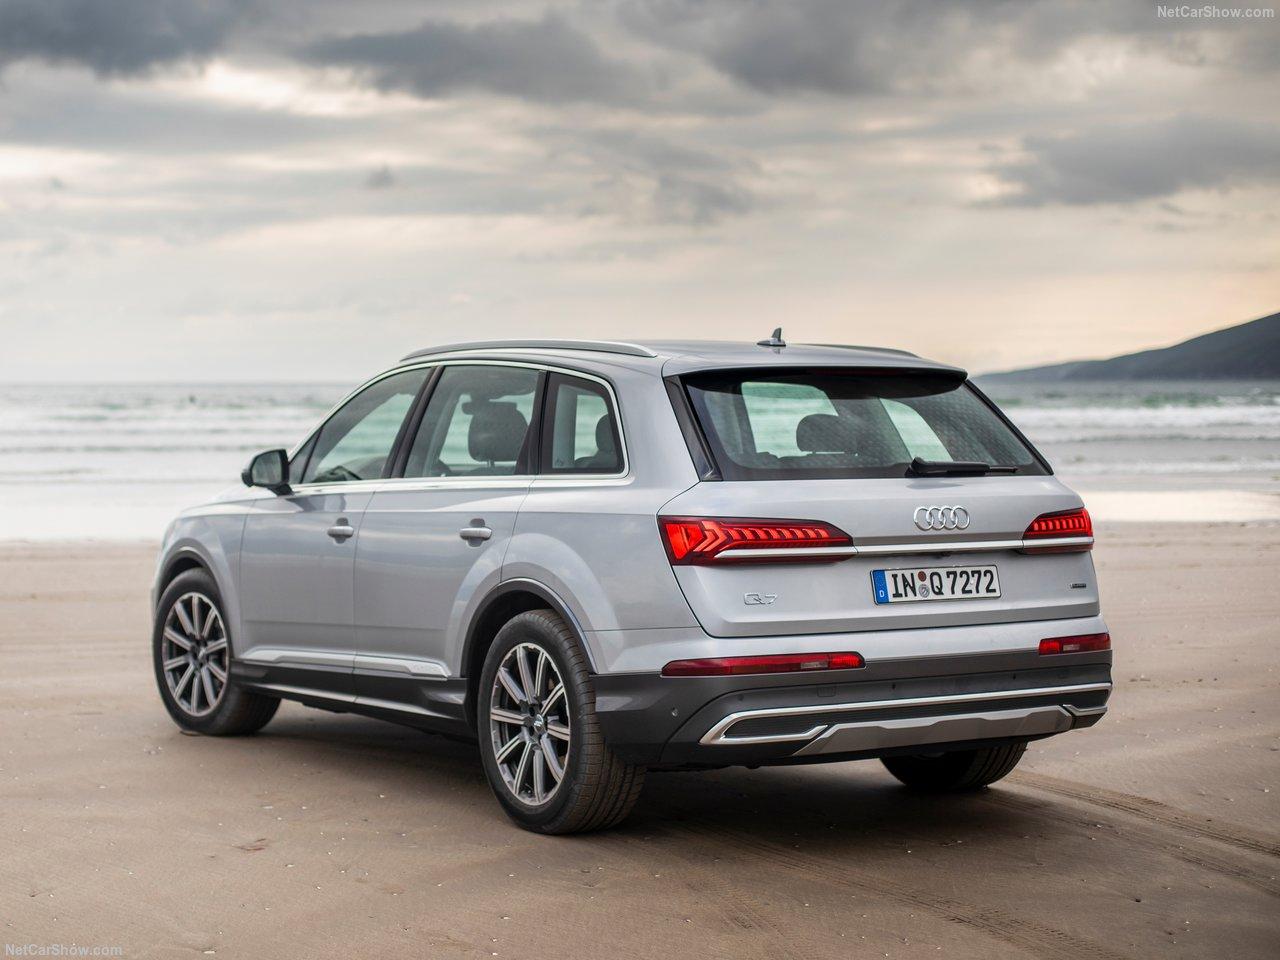 Audi-Q7-2020-1280-34.jpg